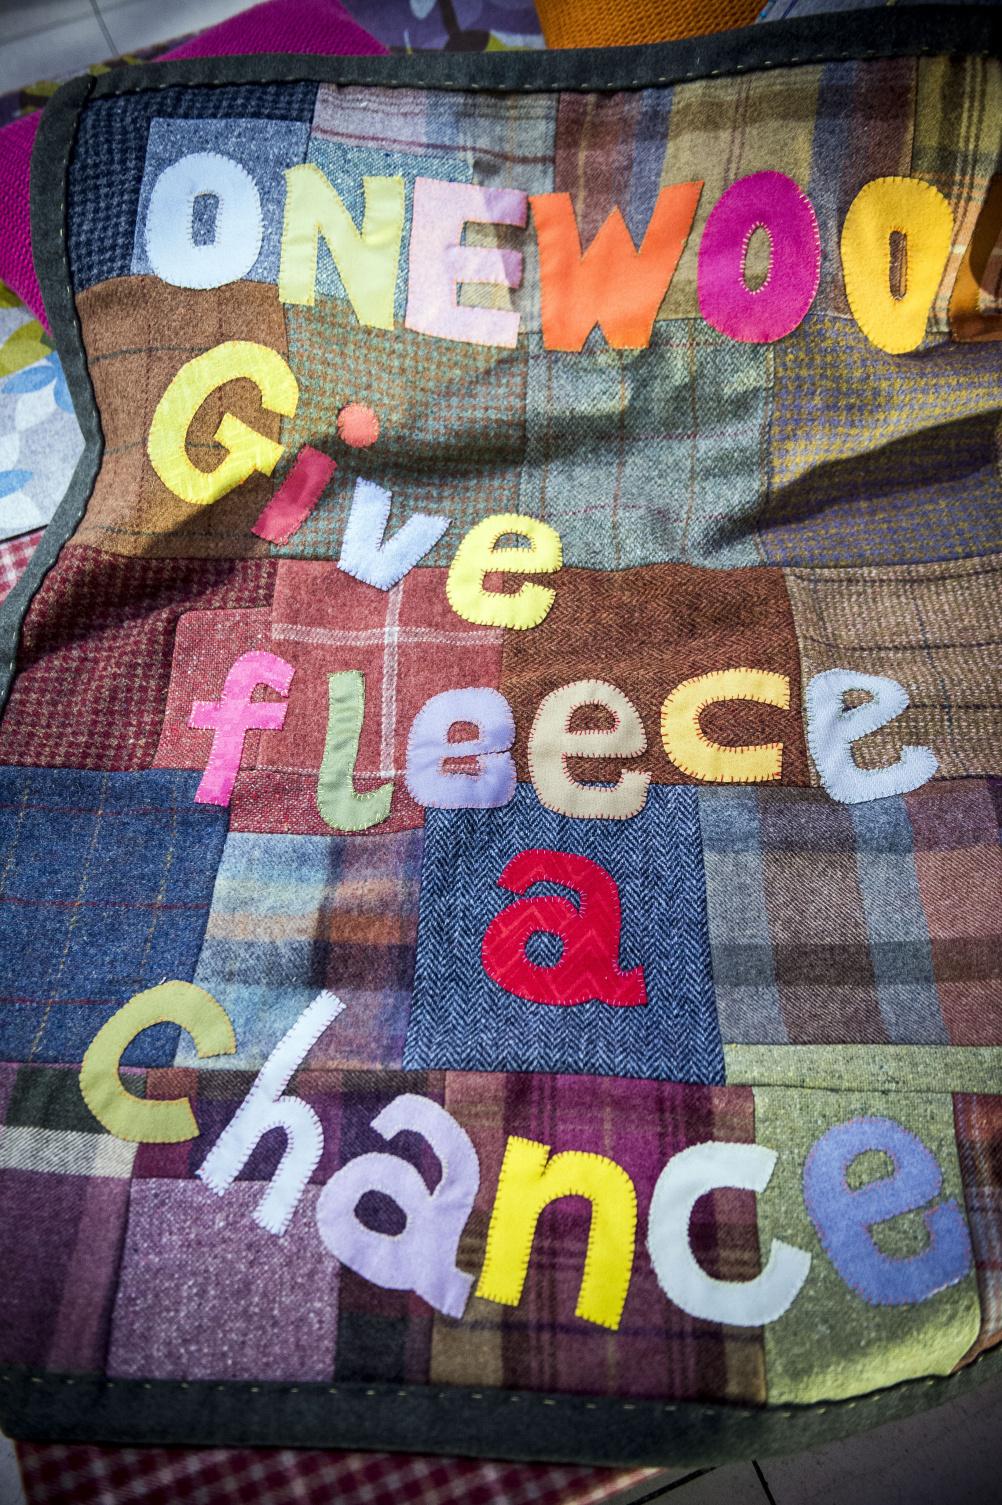 Give fleece a chance